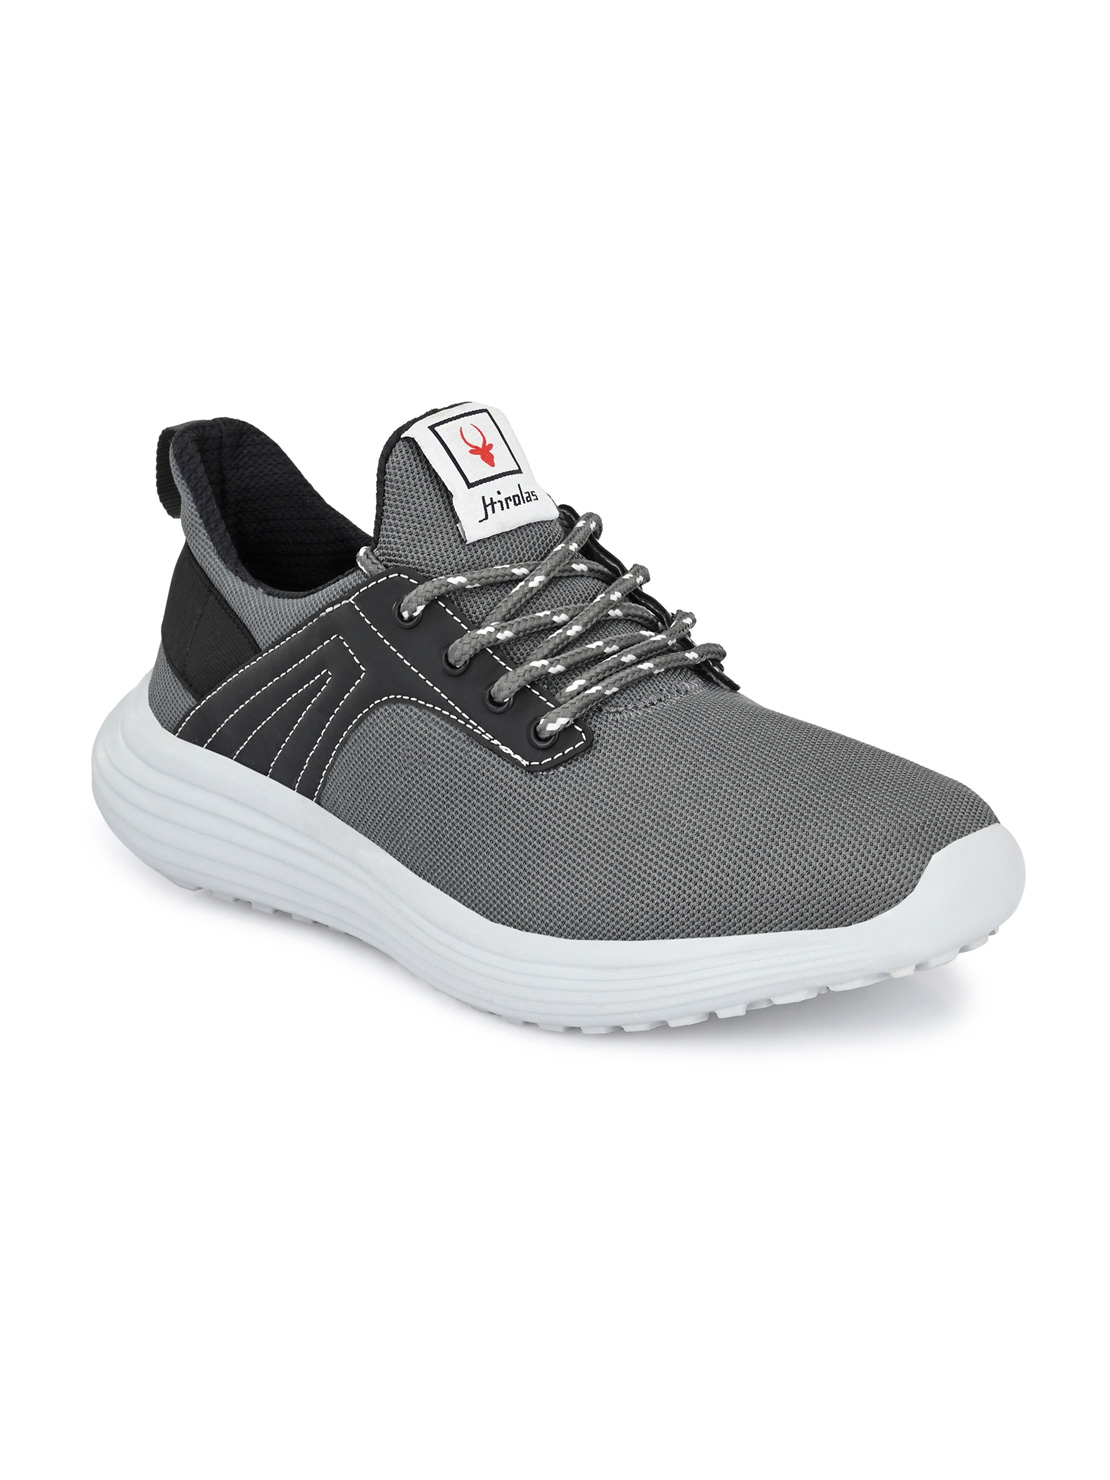 Hirolas | Hirolas® Men's Mesh Grey Running/Walking/Gym Sports Sneaker Shoes